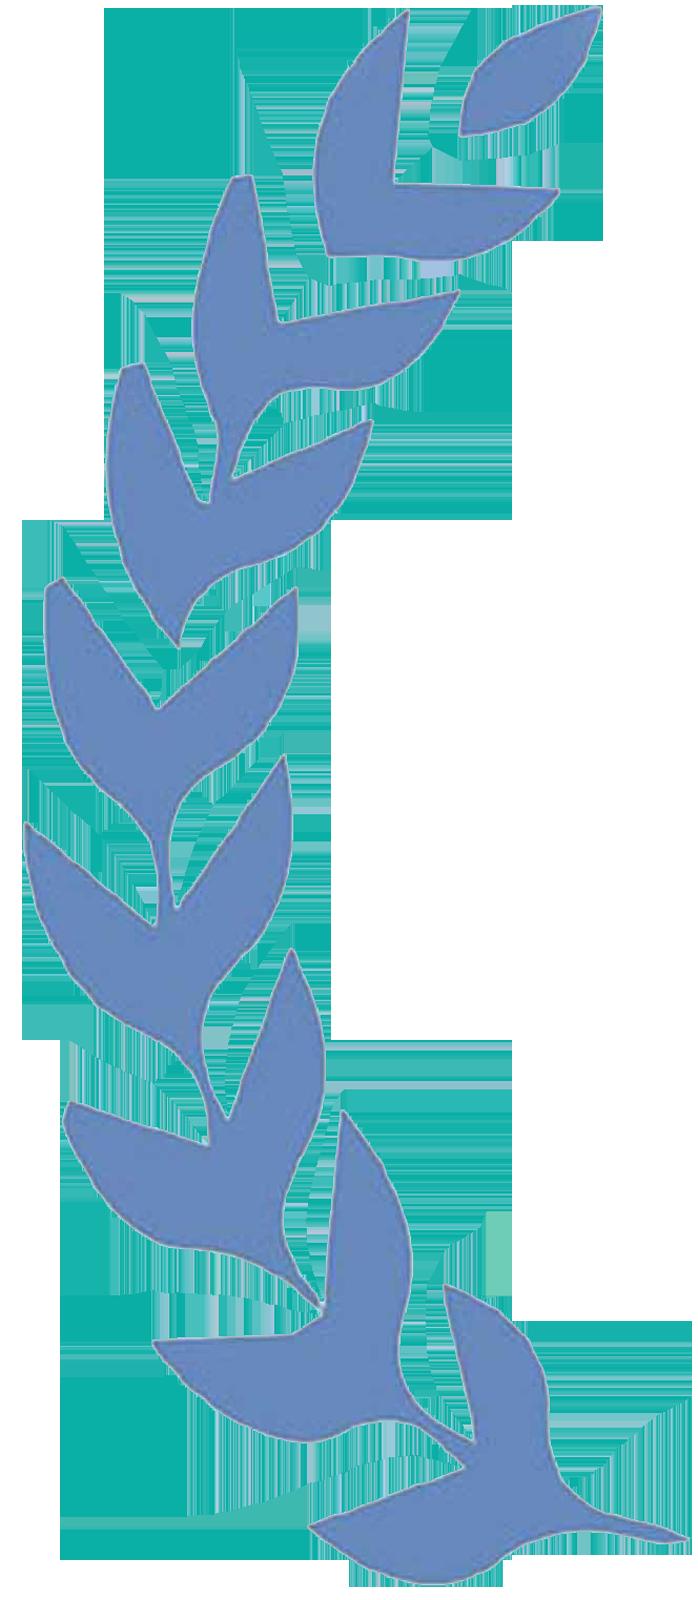 Leader clipart world leader. Global business awards accenture